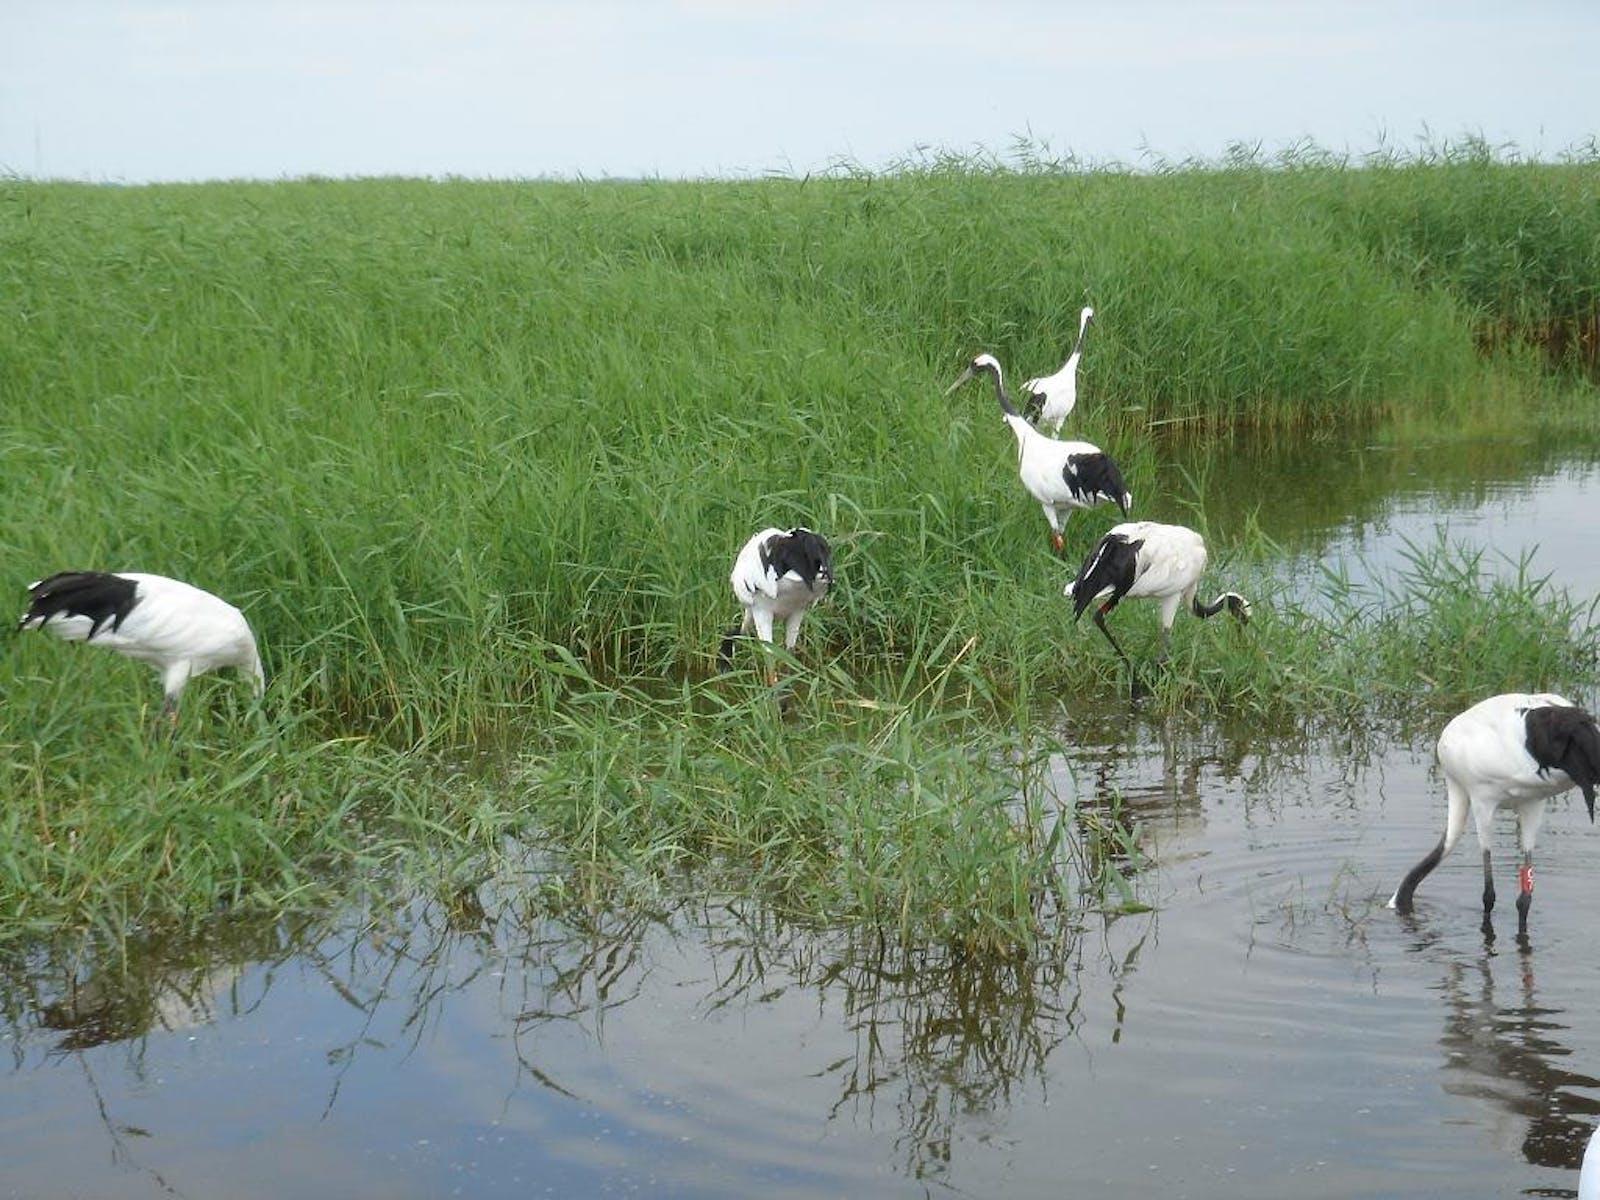 Nenjiang River Grassland